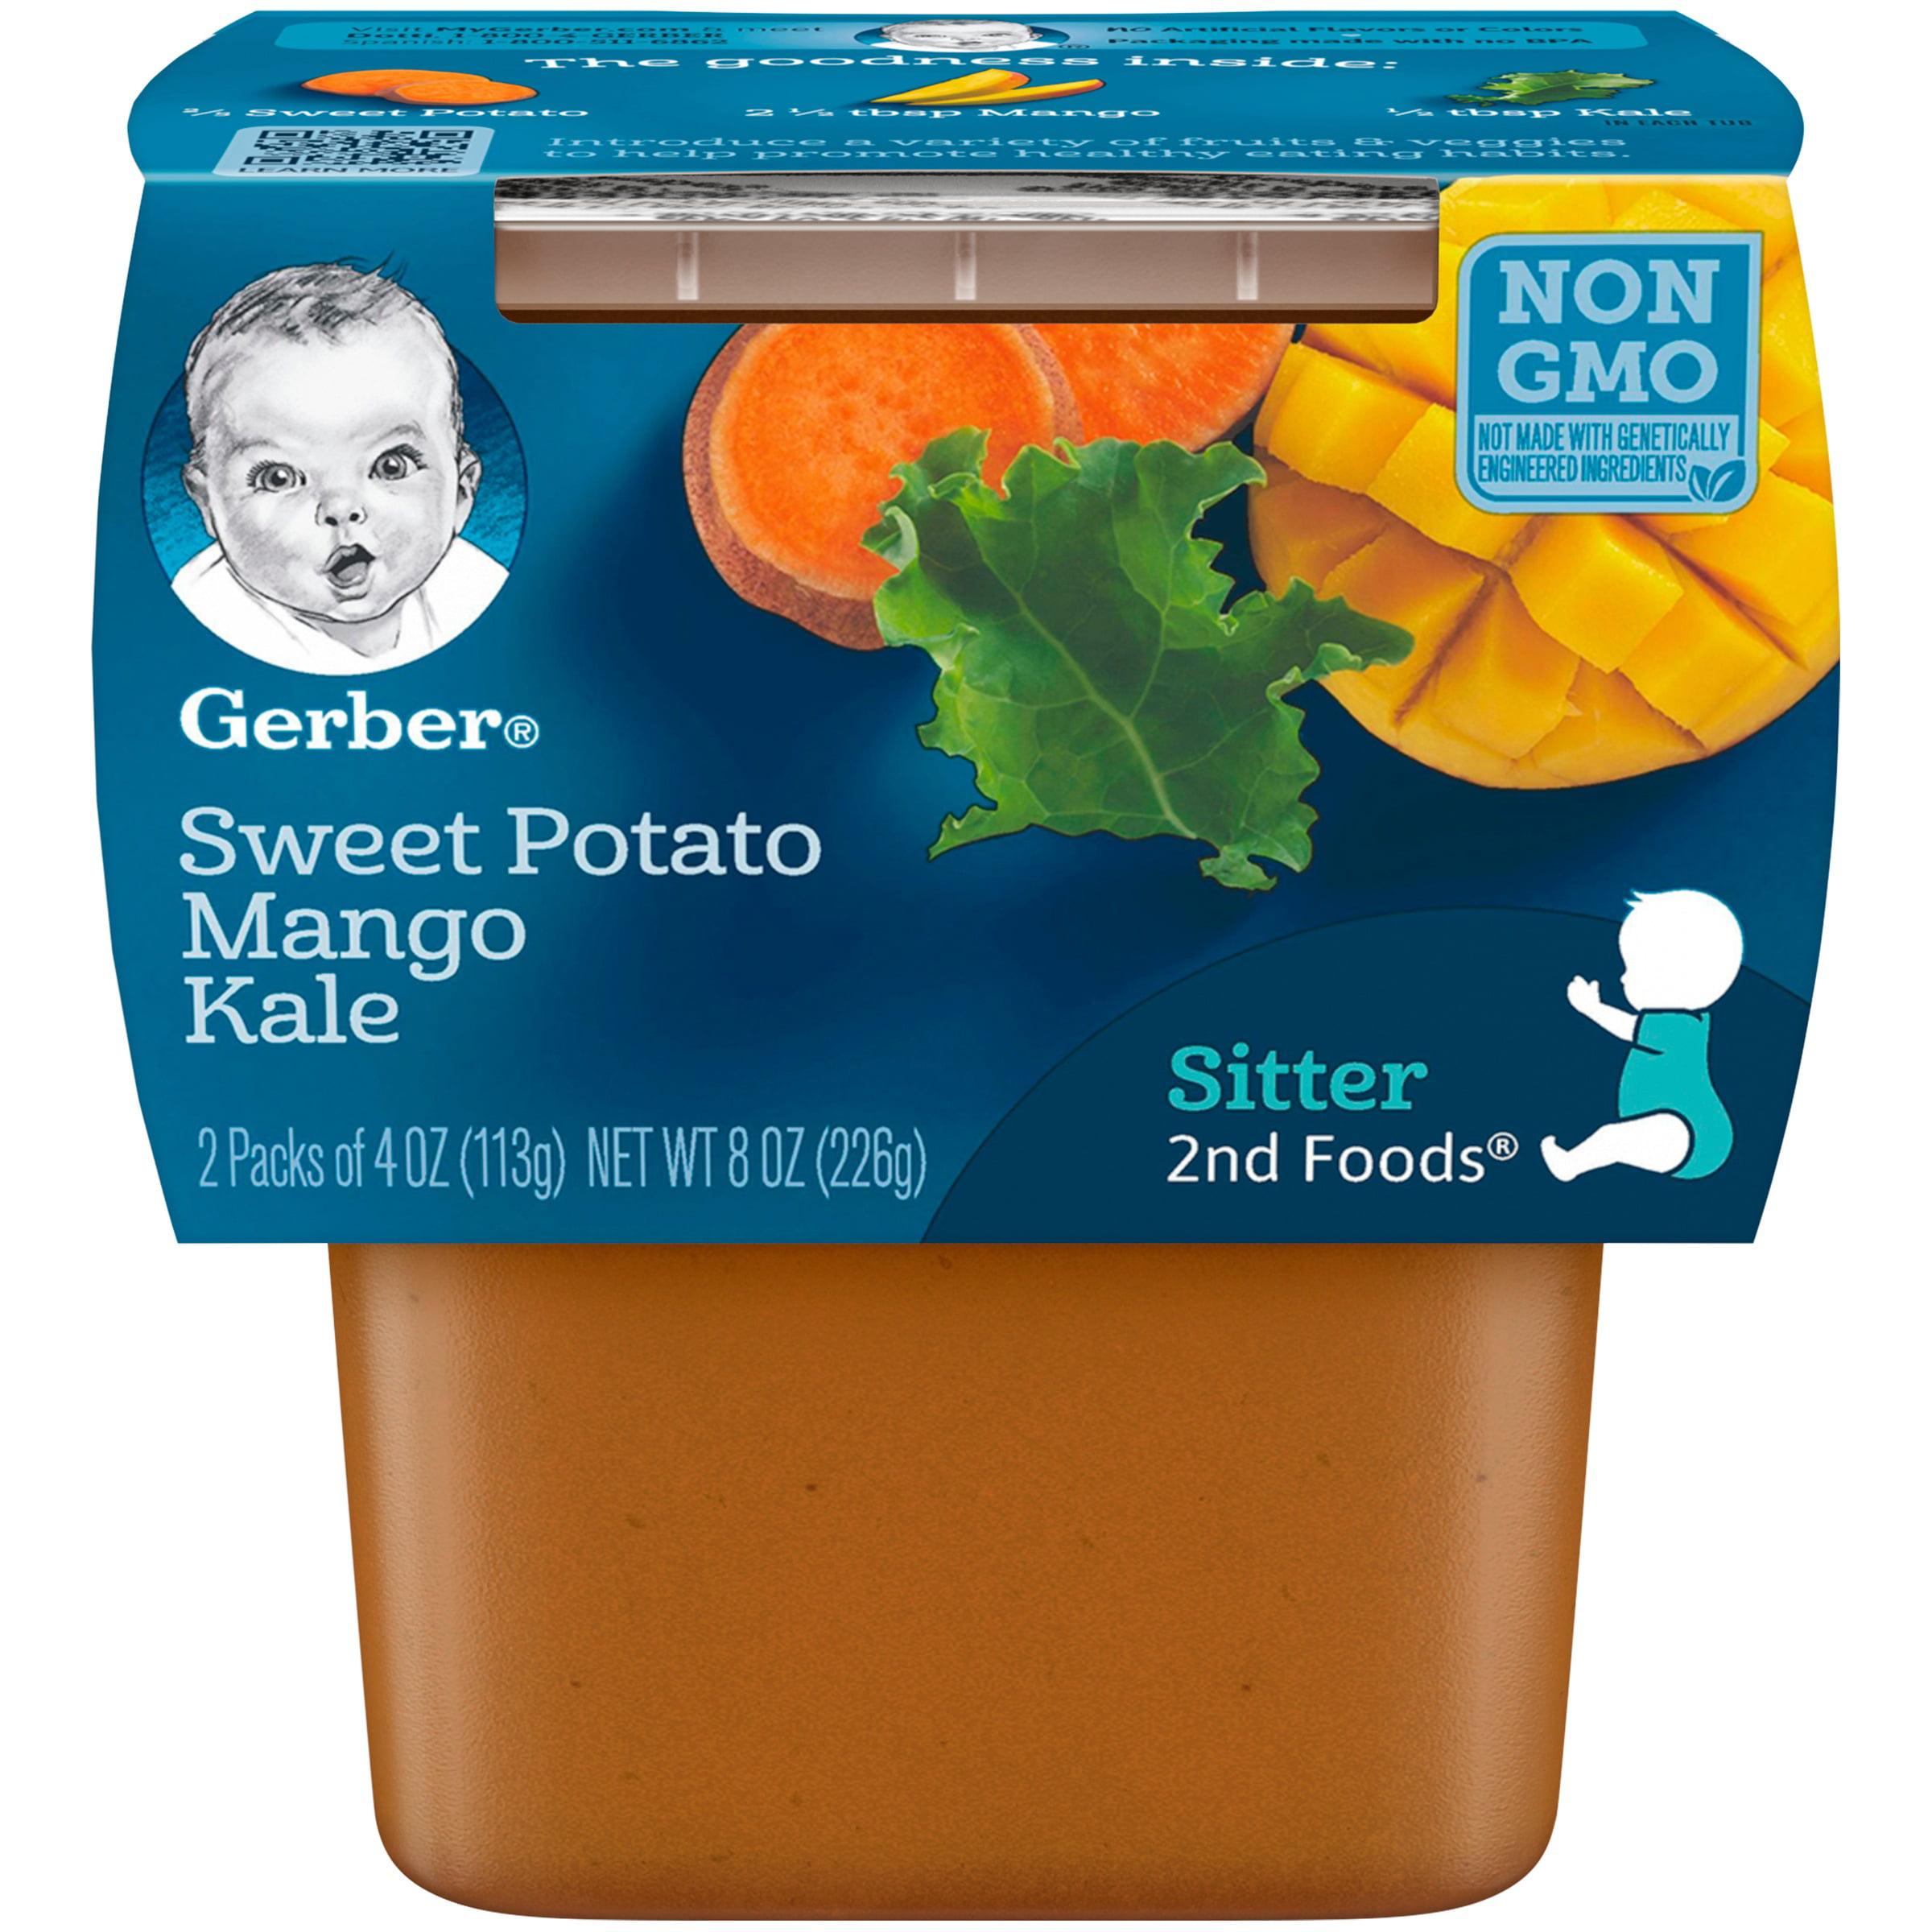 Gerber 2nd Foods Sweet Potato Mango Kale Baby Food, 6-4 oz. Tubs